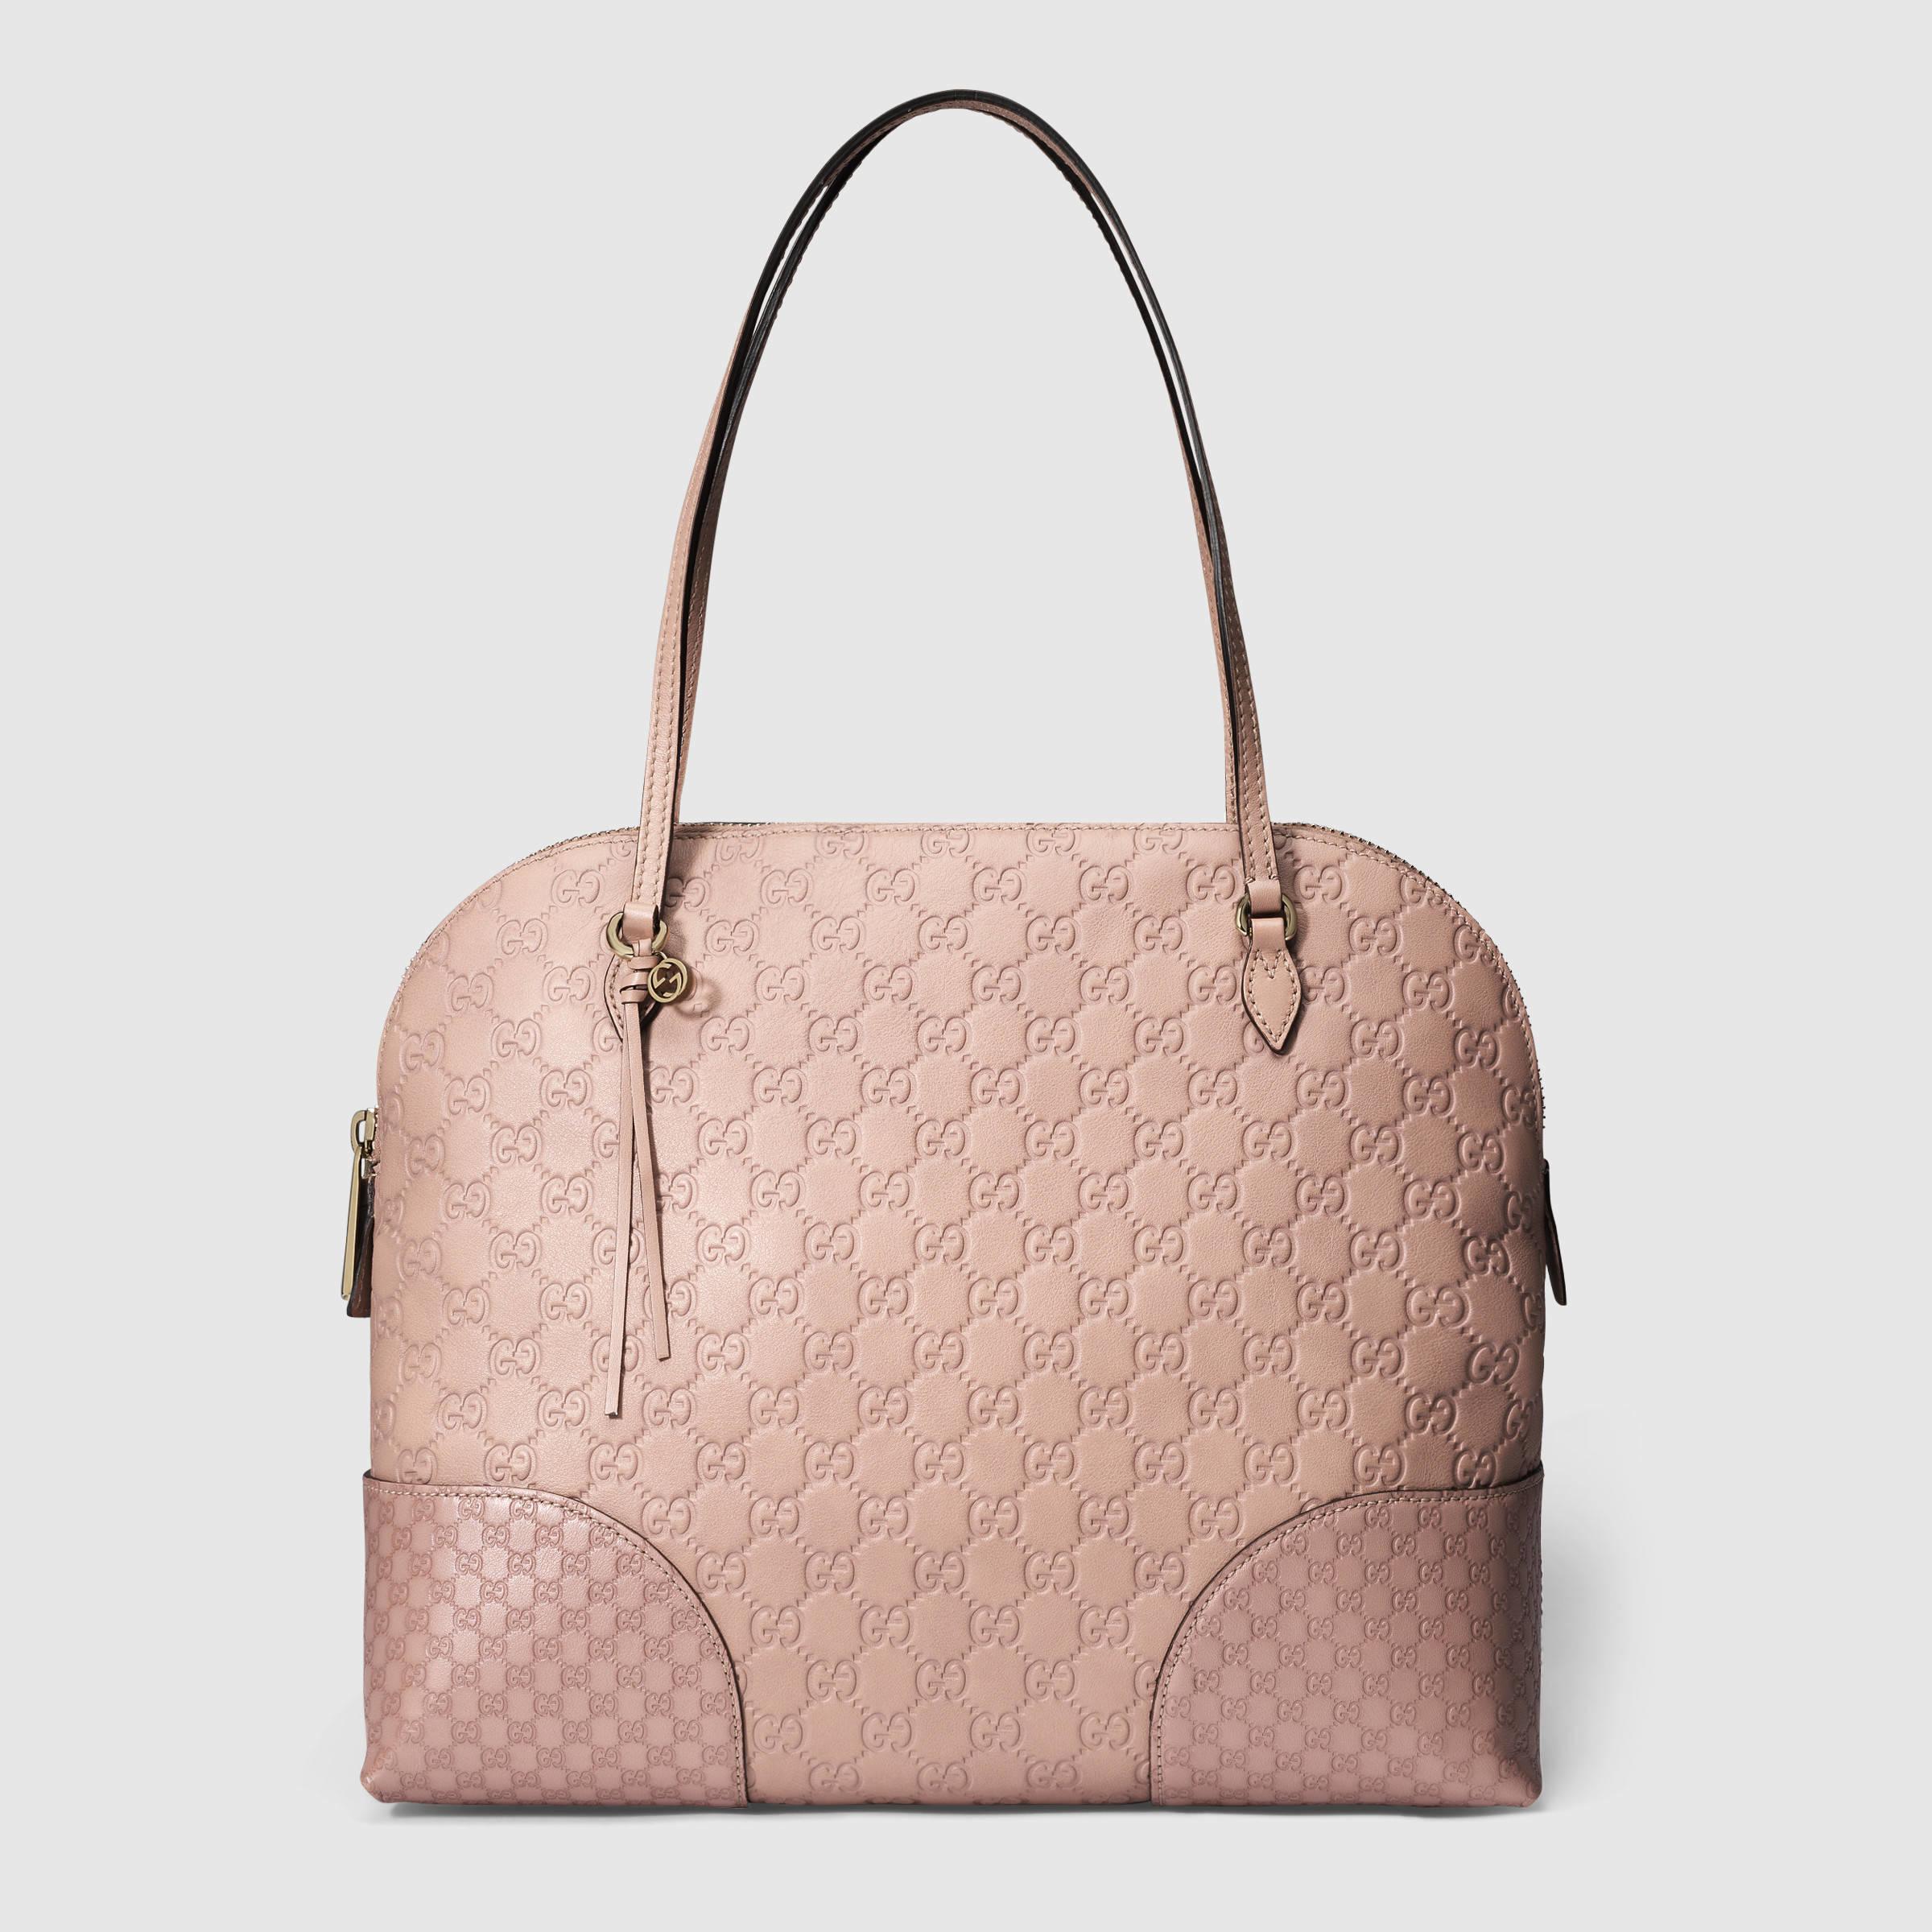 7991f7fd857 Lyst - Gucci Bree Guccissima Shoulder Bag in Pink